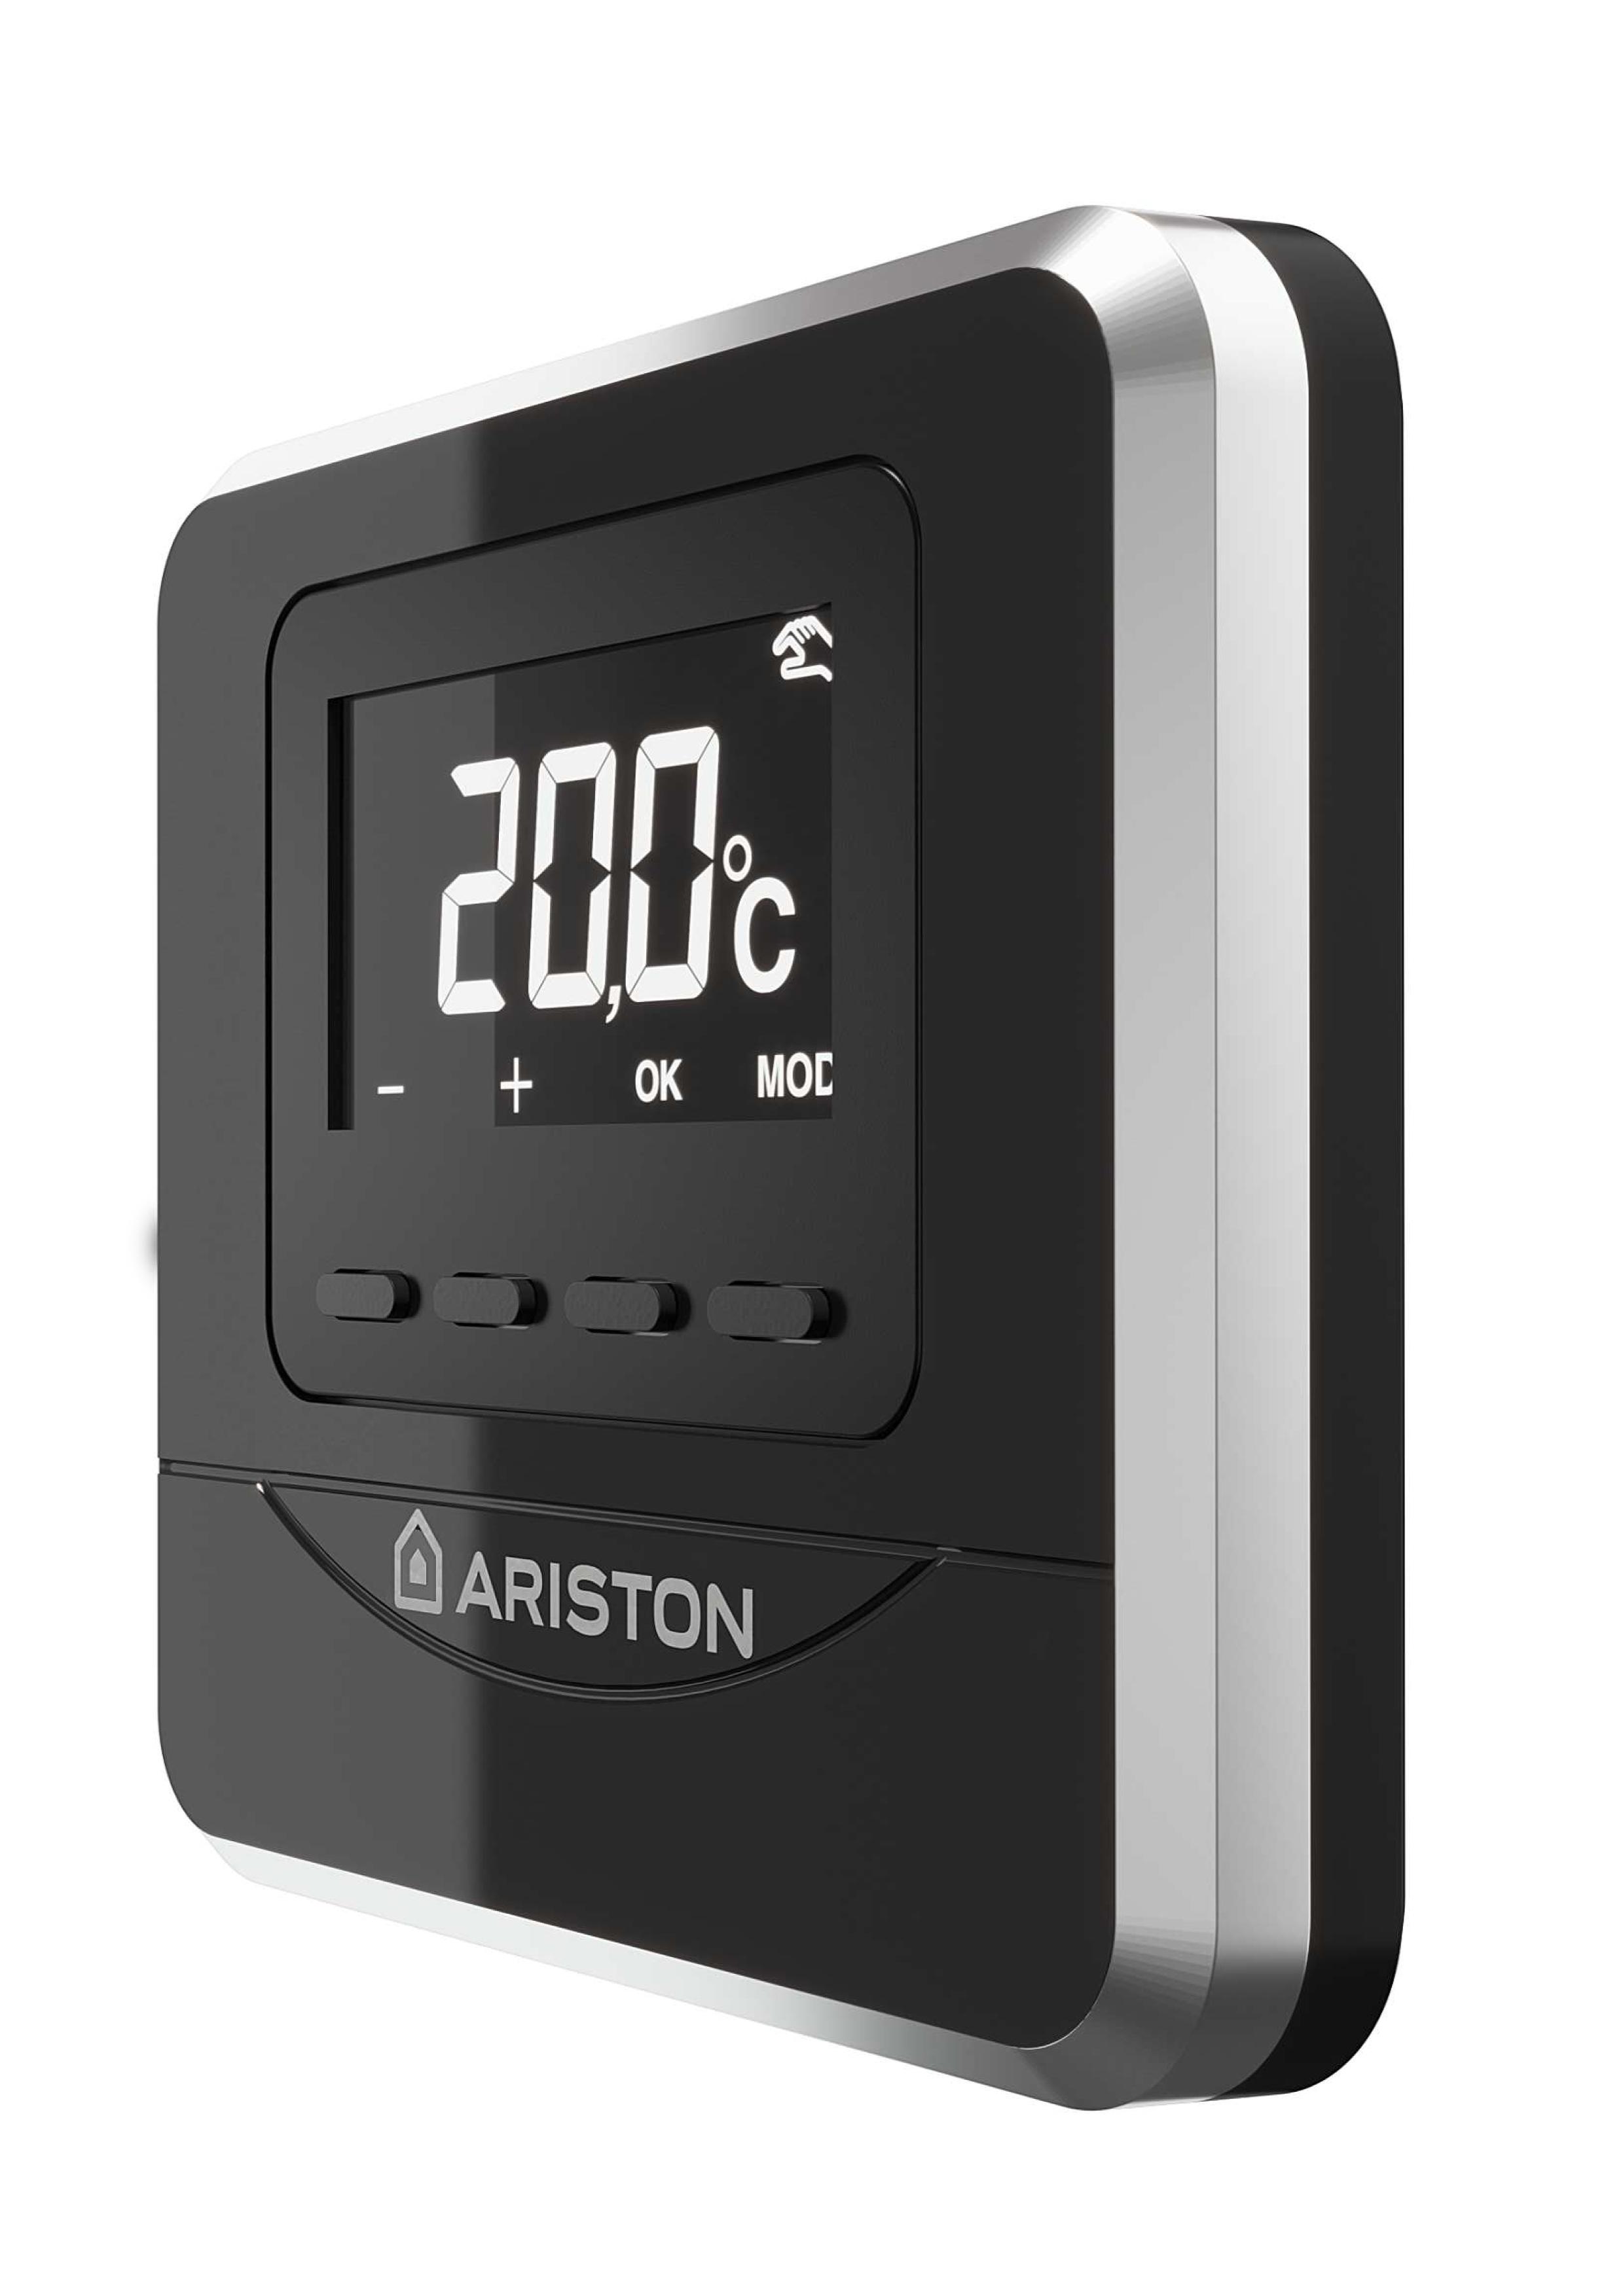 32 Ariston Cube Room Sensor